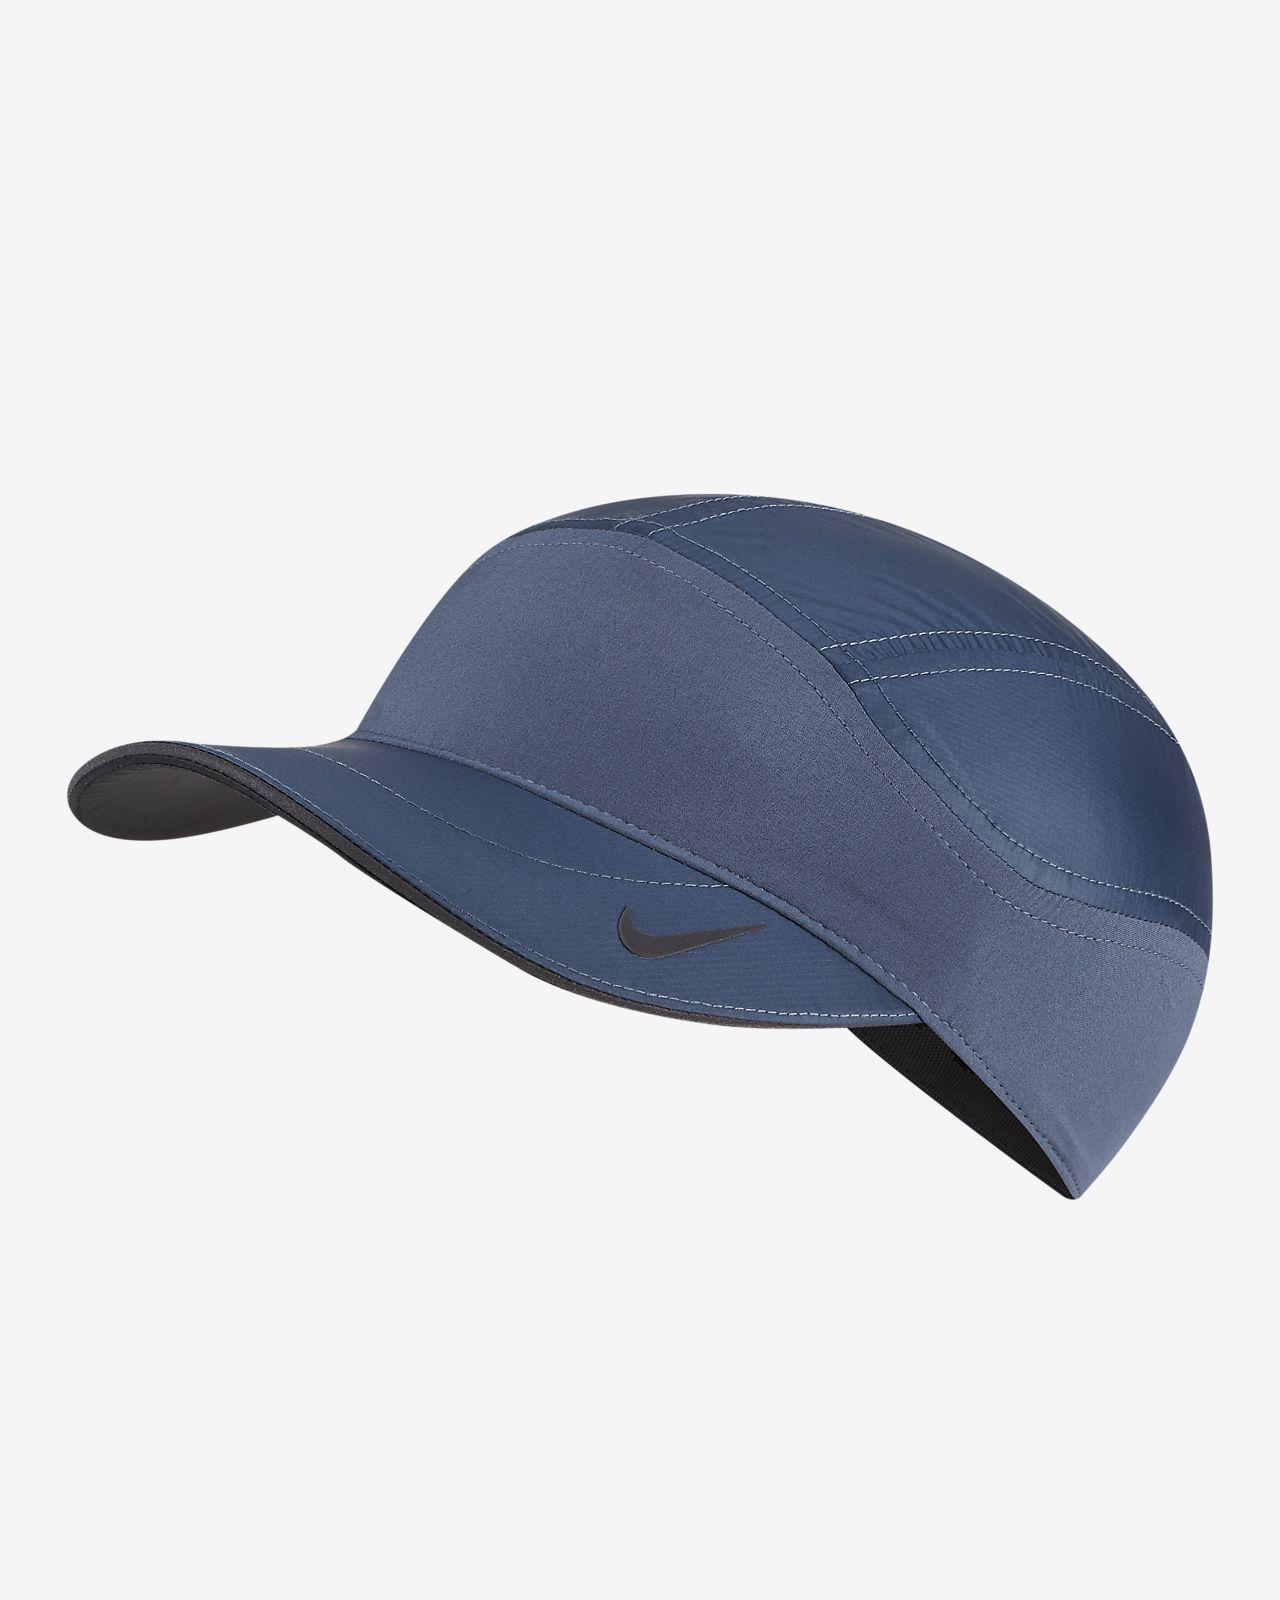 4adddd5bace47 Gorra ajustable de running Nike Tailwind. Nike.com MX